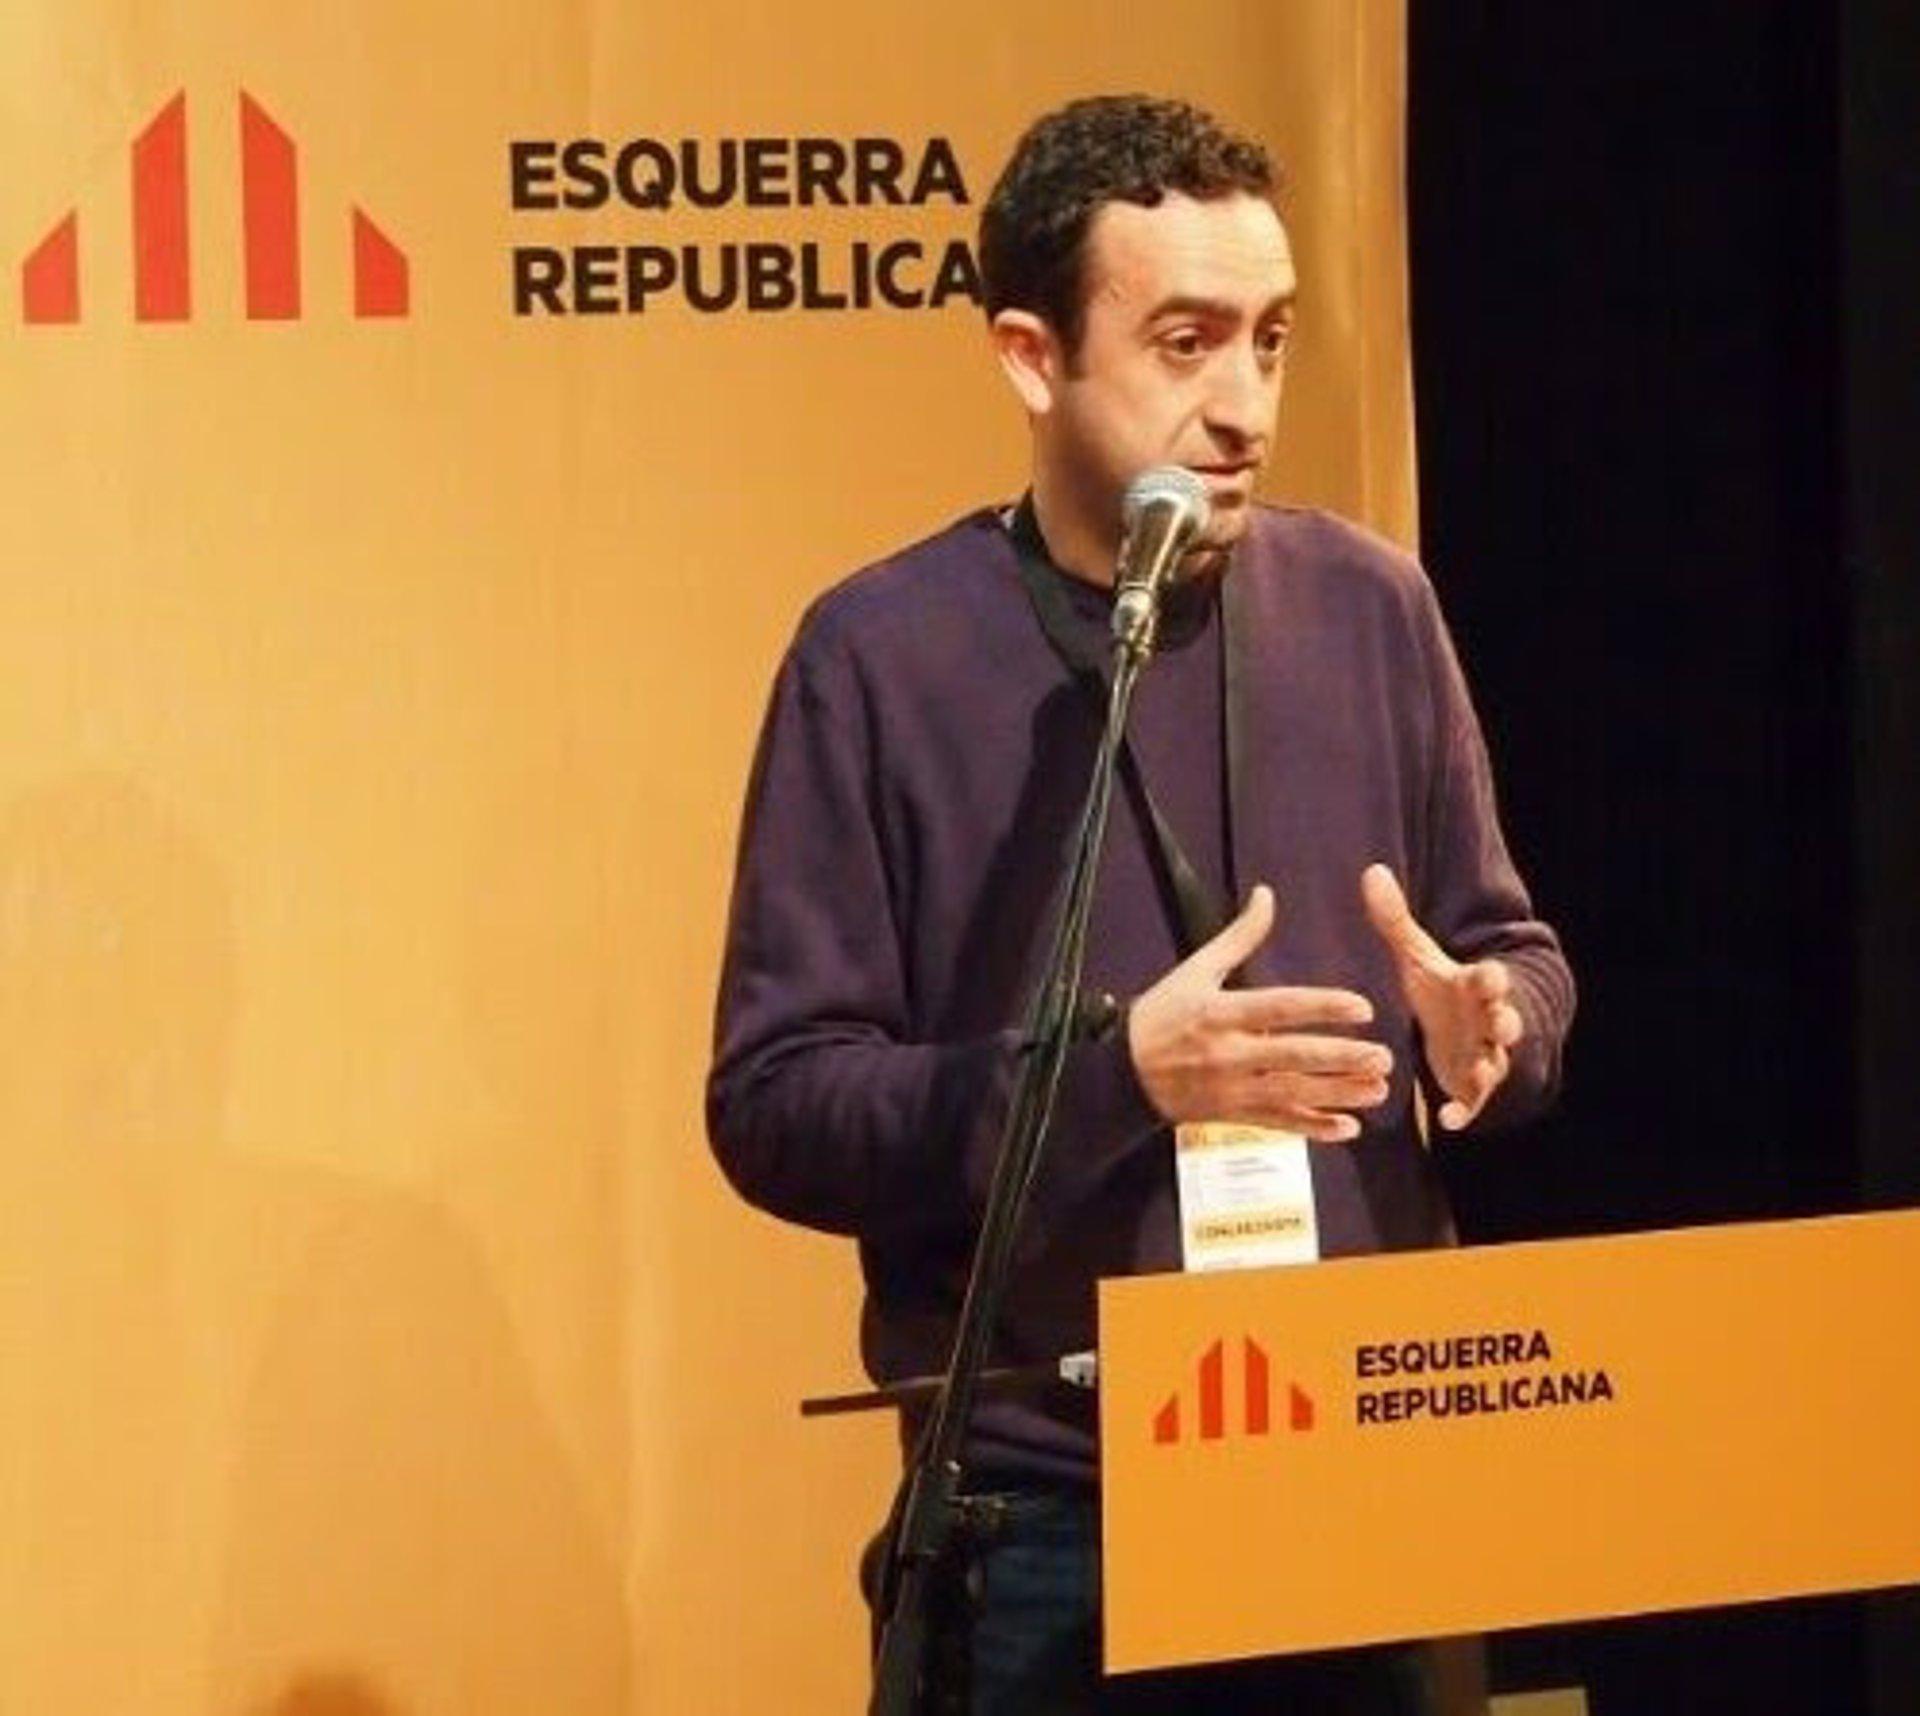 https://img.europapress.es/fotoweb/fotonoticia_20180508192735_1920.jpg